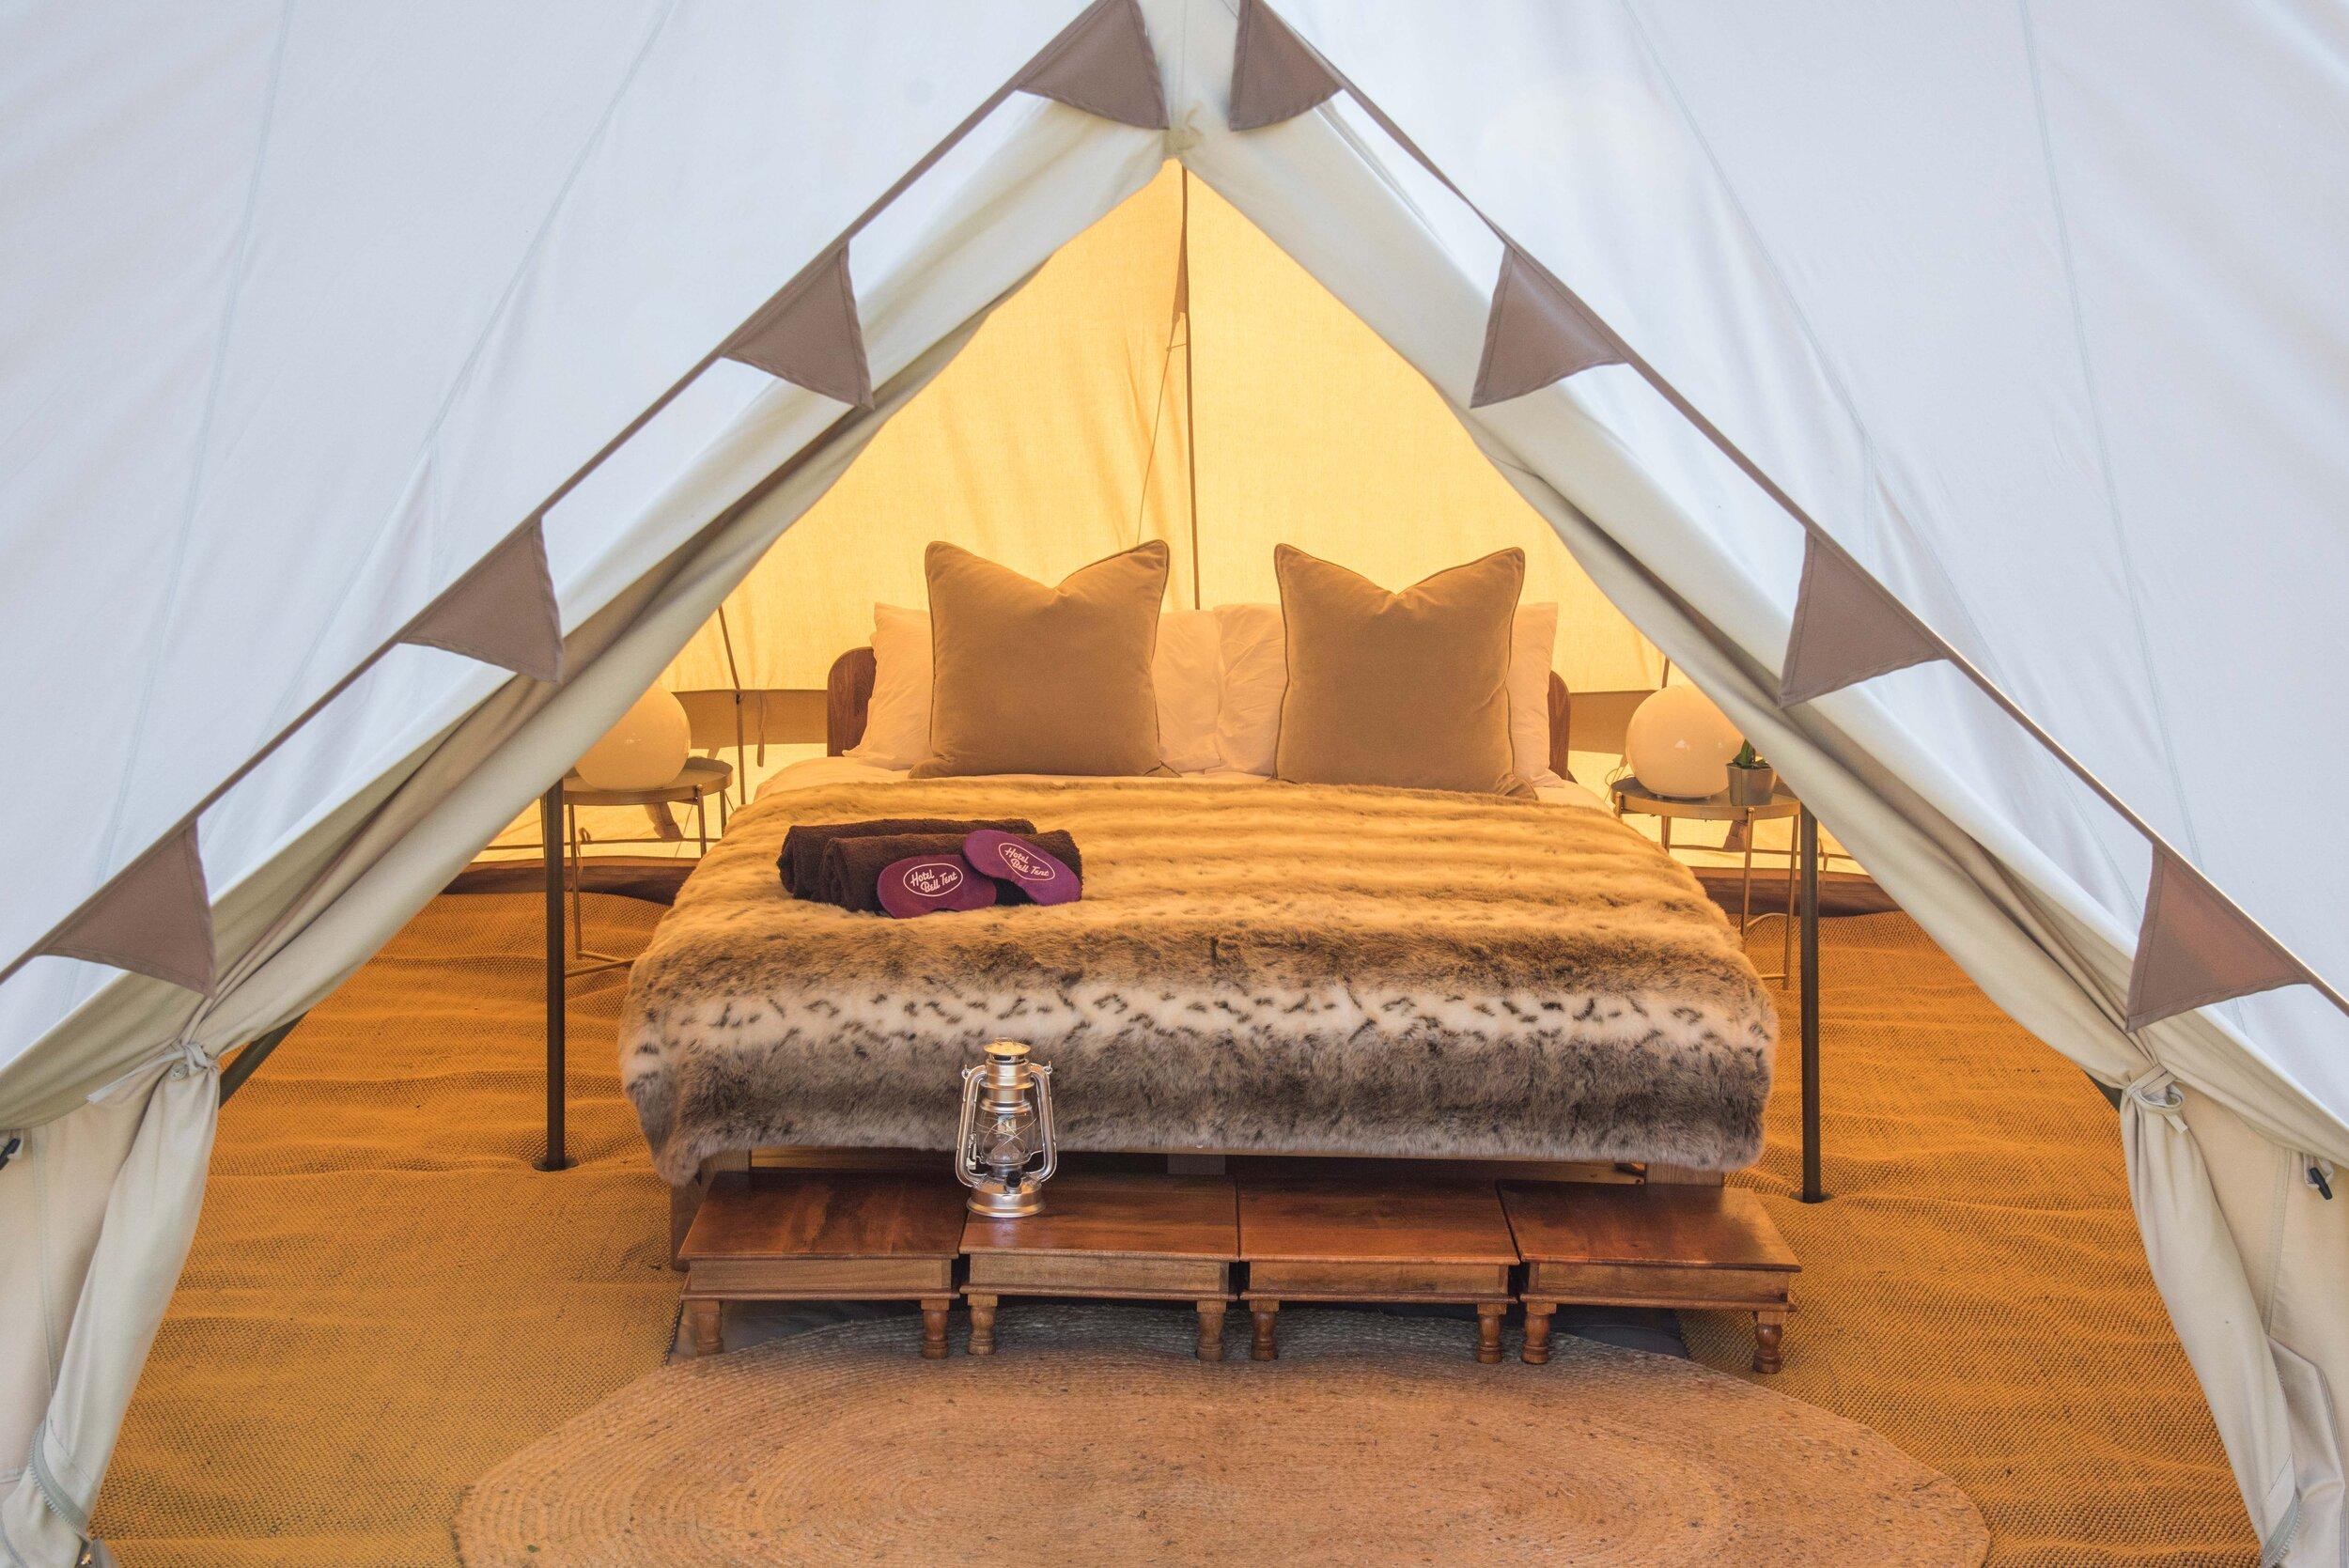 hotel_bell_tent_vip-4.jpg